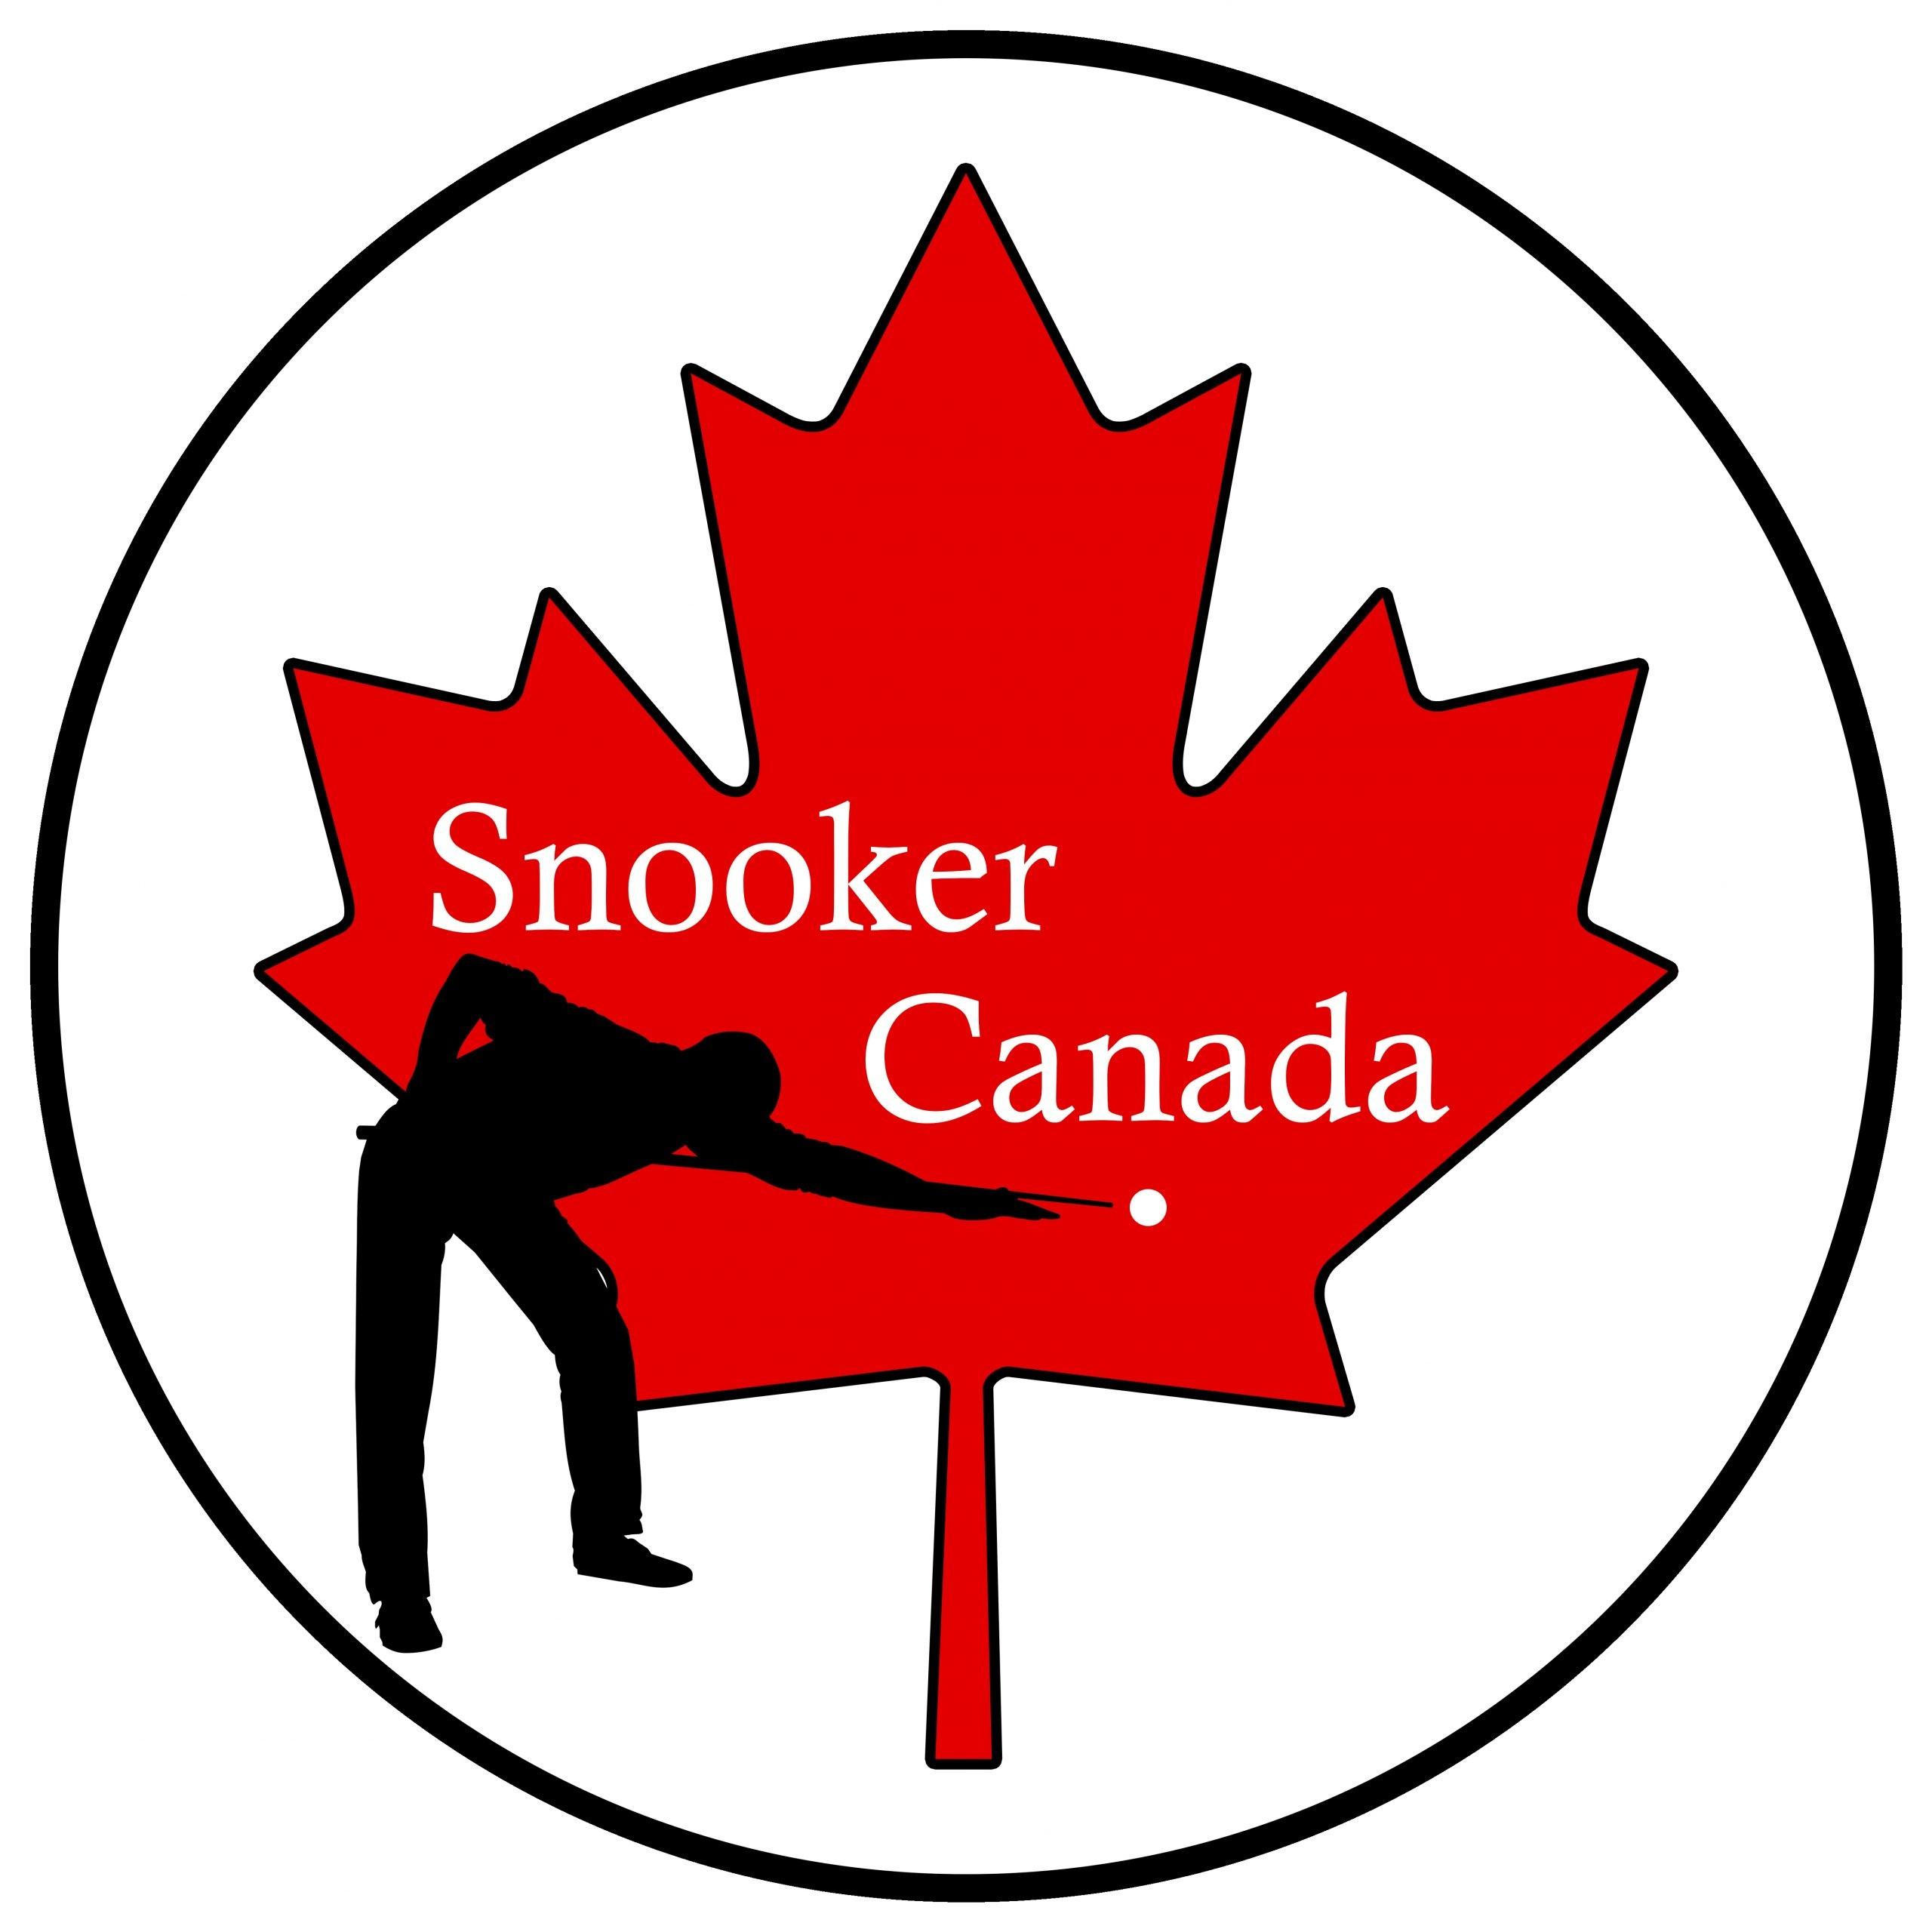 Authorised Stockist – Snooker Canada